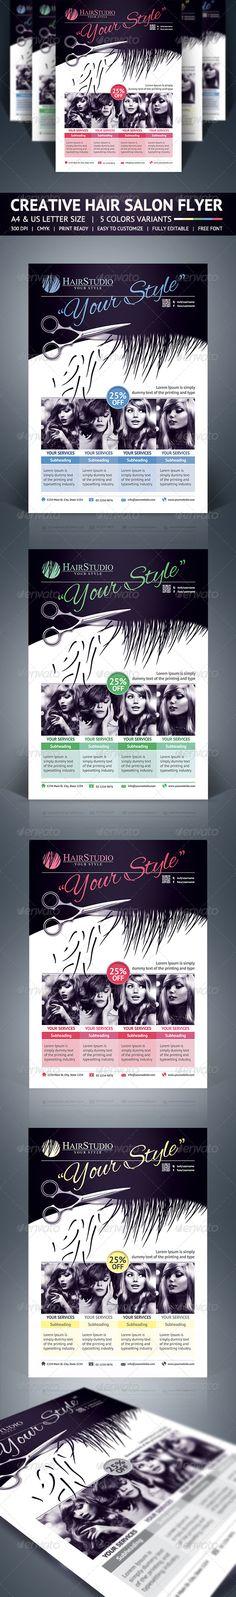 City Hair Salon Promotional Flyer  Promotional Flyers Print